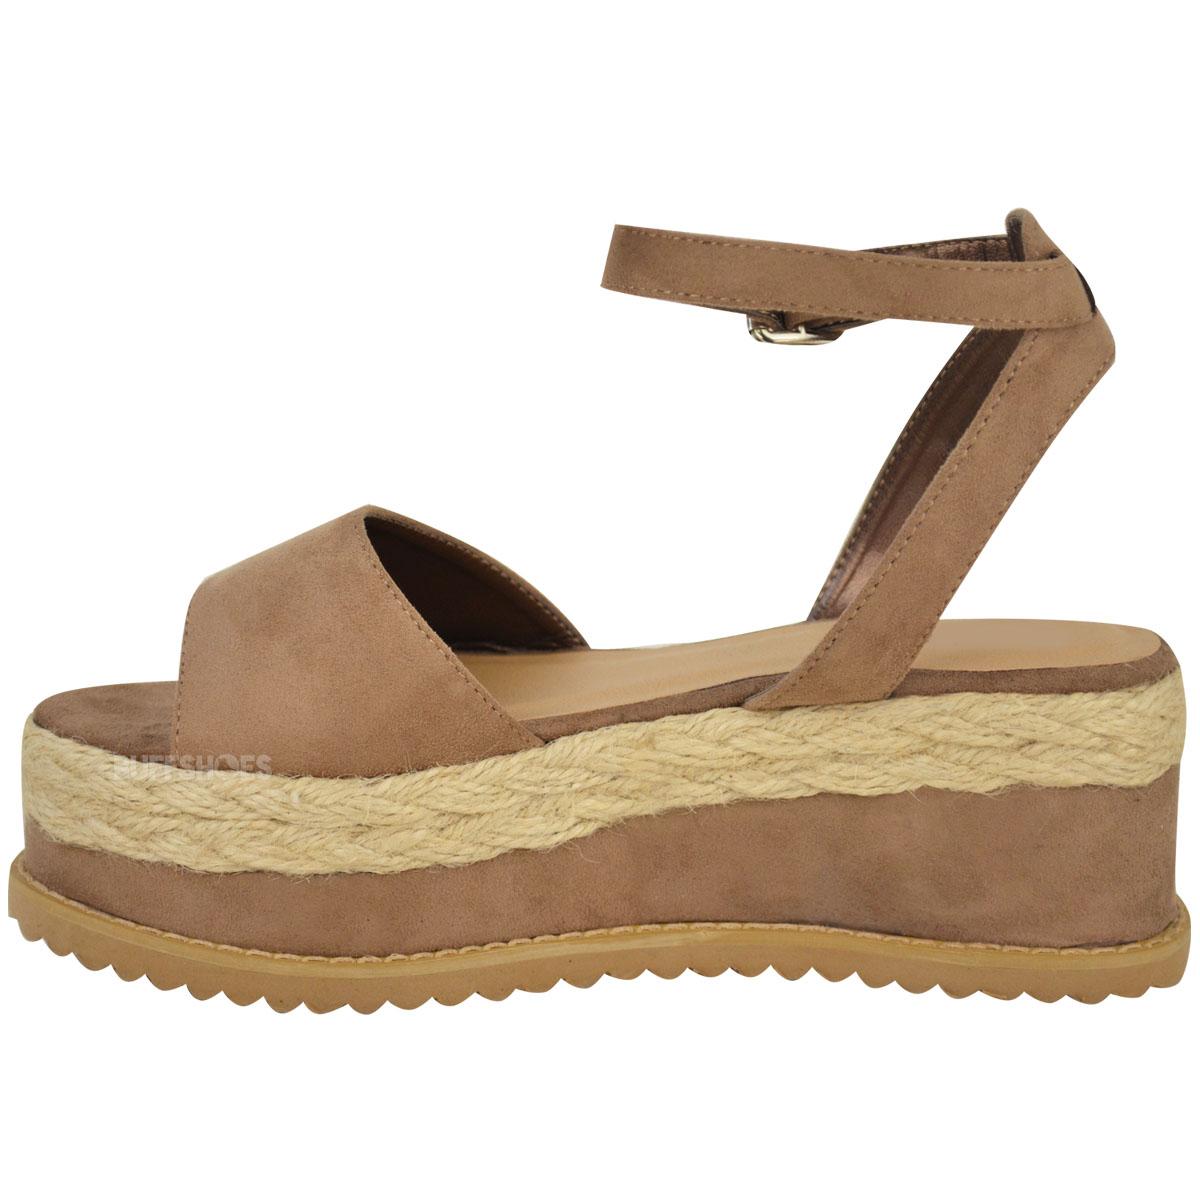 Flatform Shoes Uk